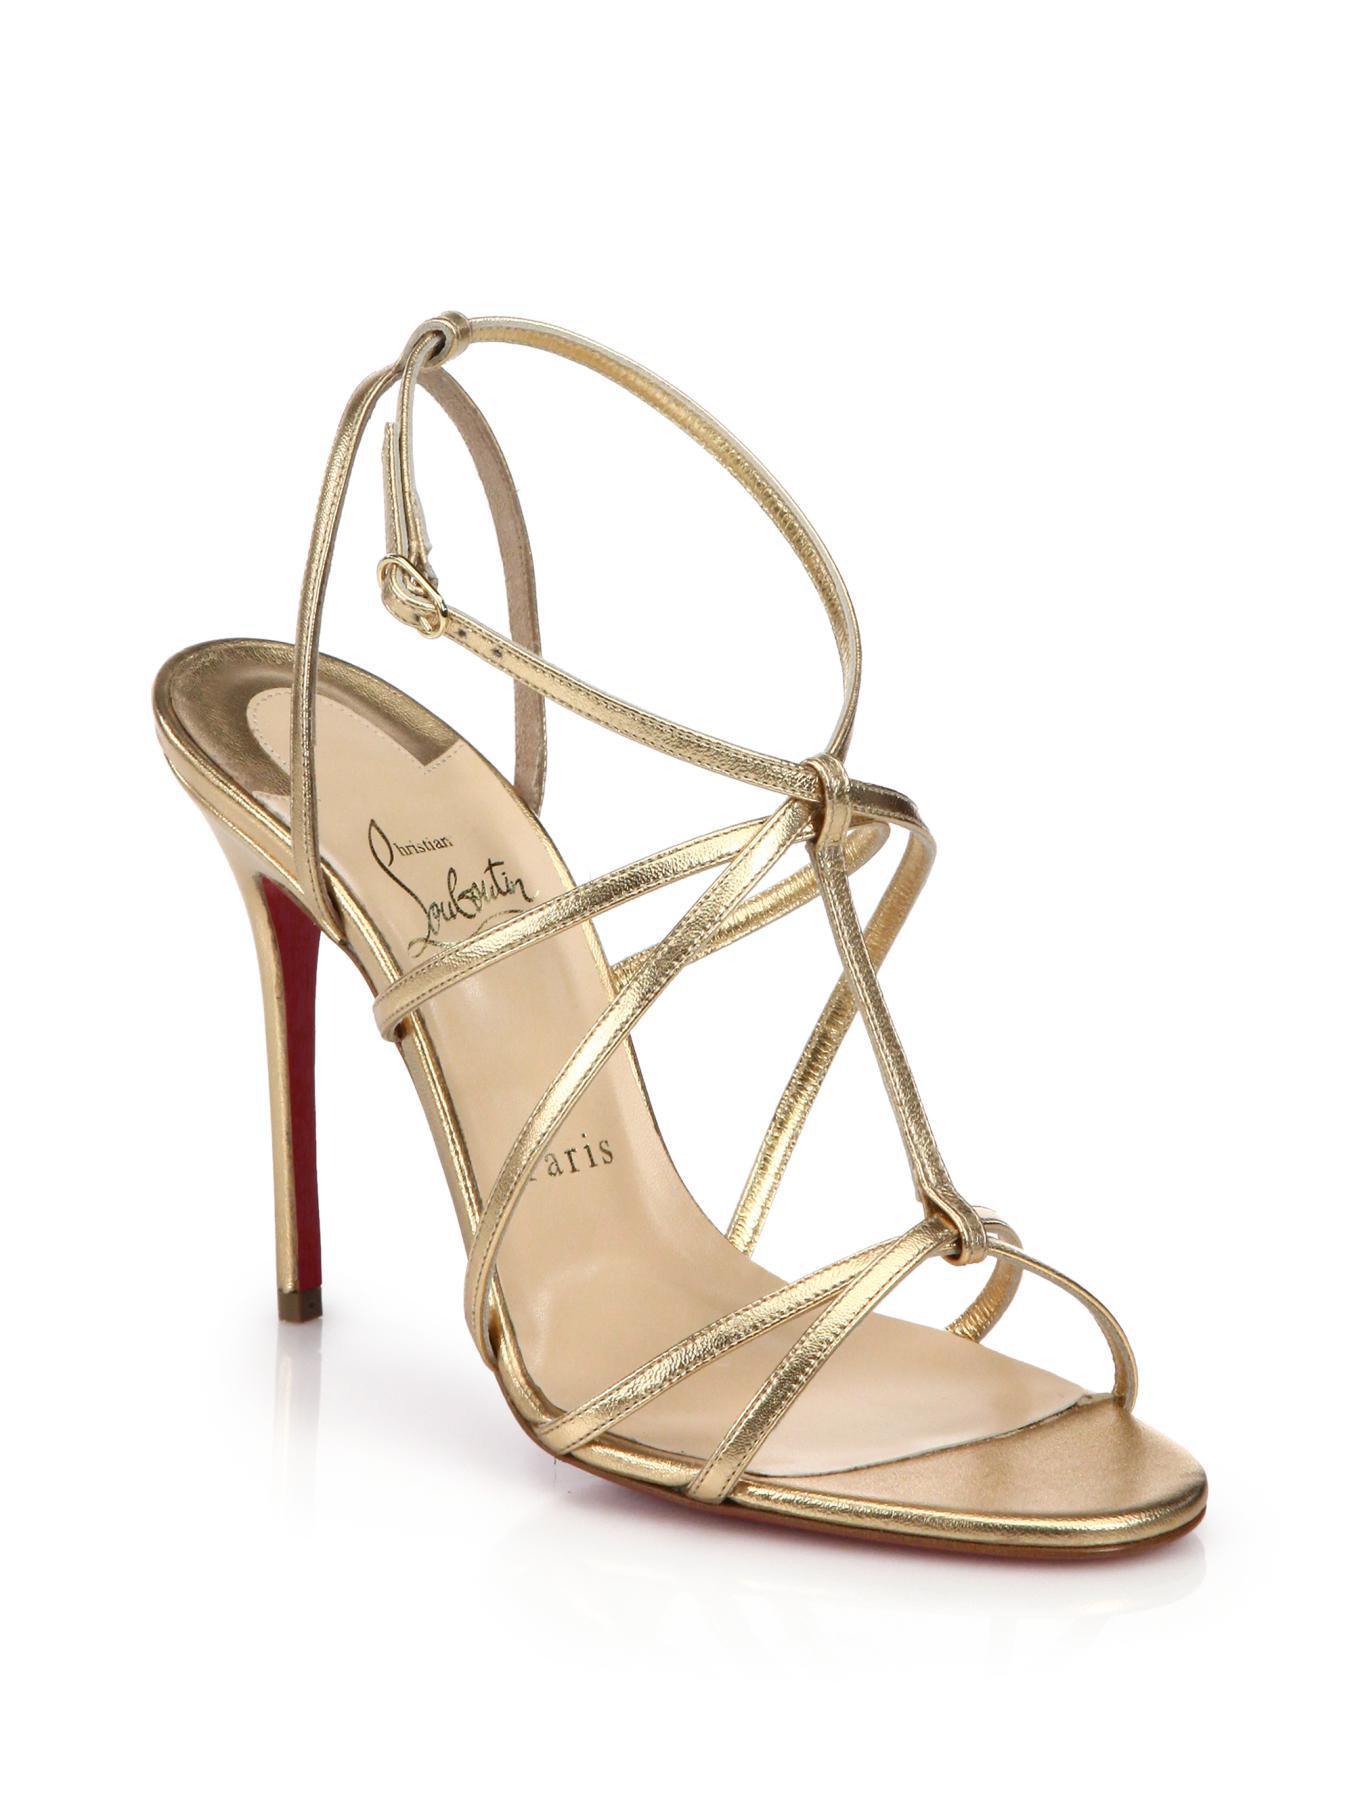 7008940d4420 Lyst - Christian Louboutin Youpiyou Metallic Leather Sandals in Metallic